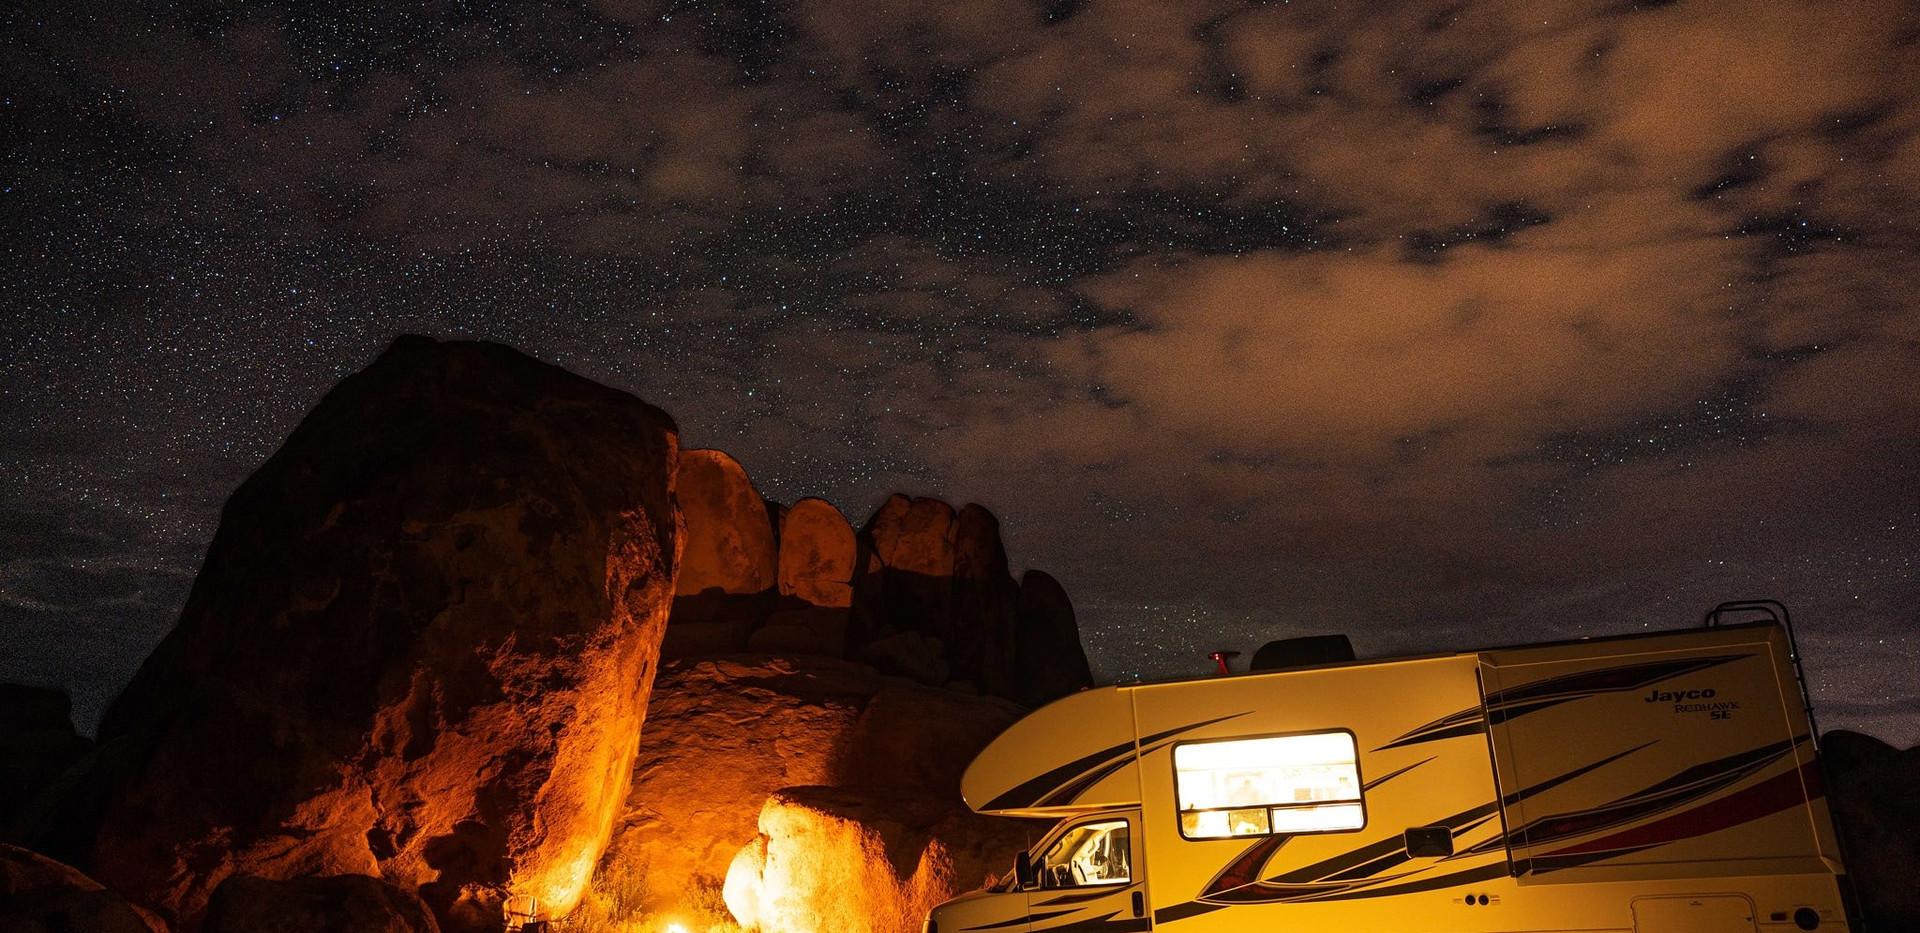 RV Rental Jayco Redhawk Camping